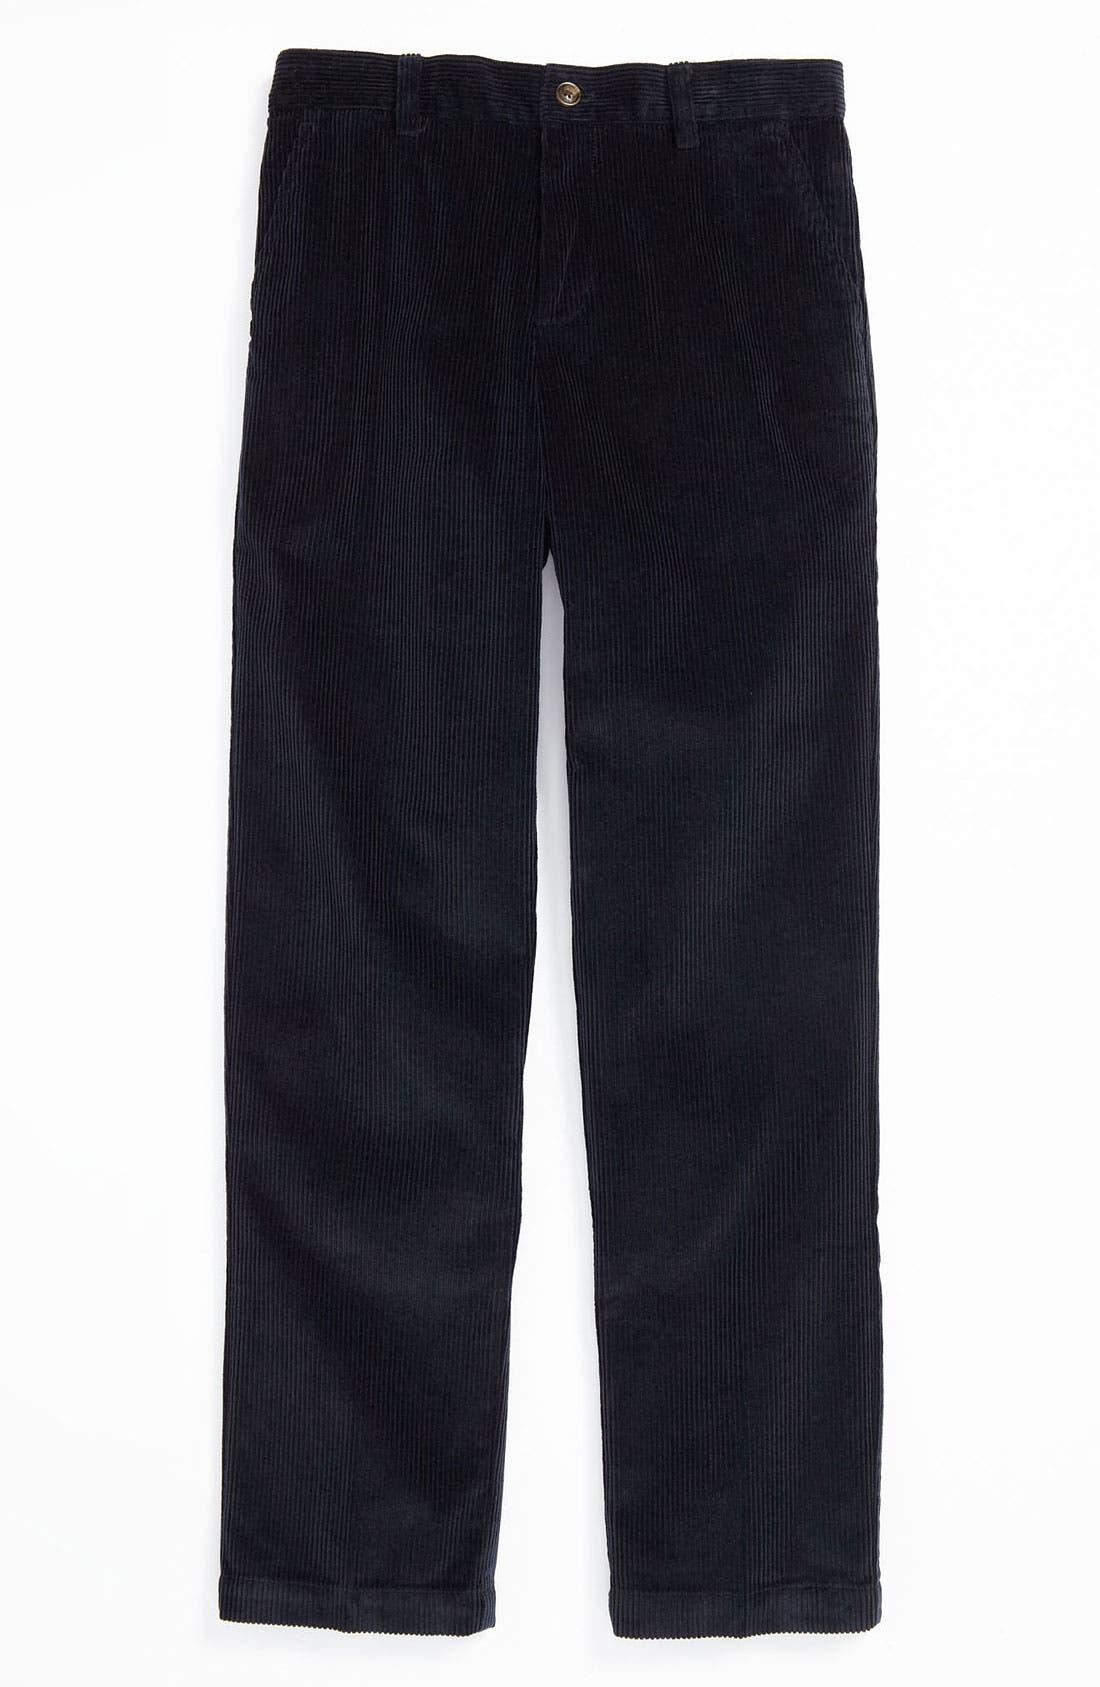 Alternate Image 1 Selected - Brooks Brothers Wide Wale Corduroy Pants (Big Boys)